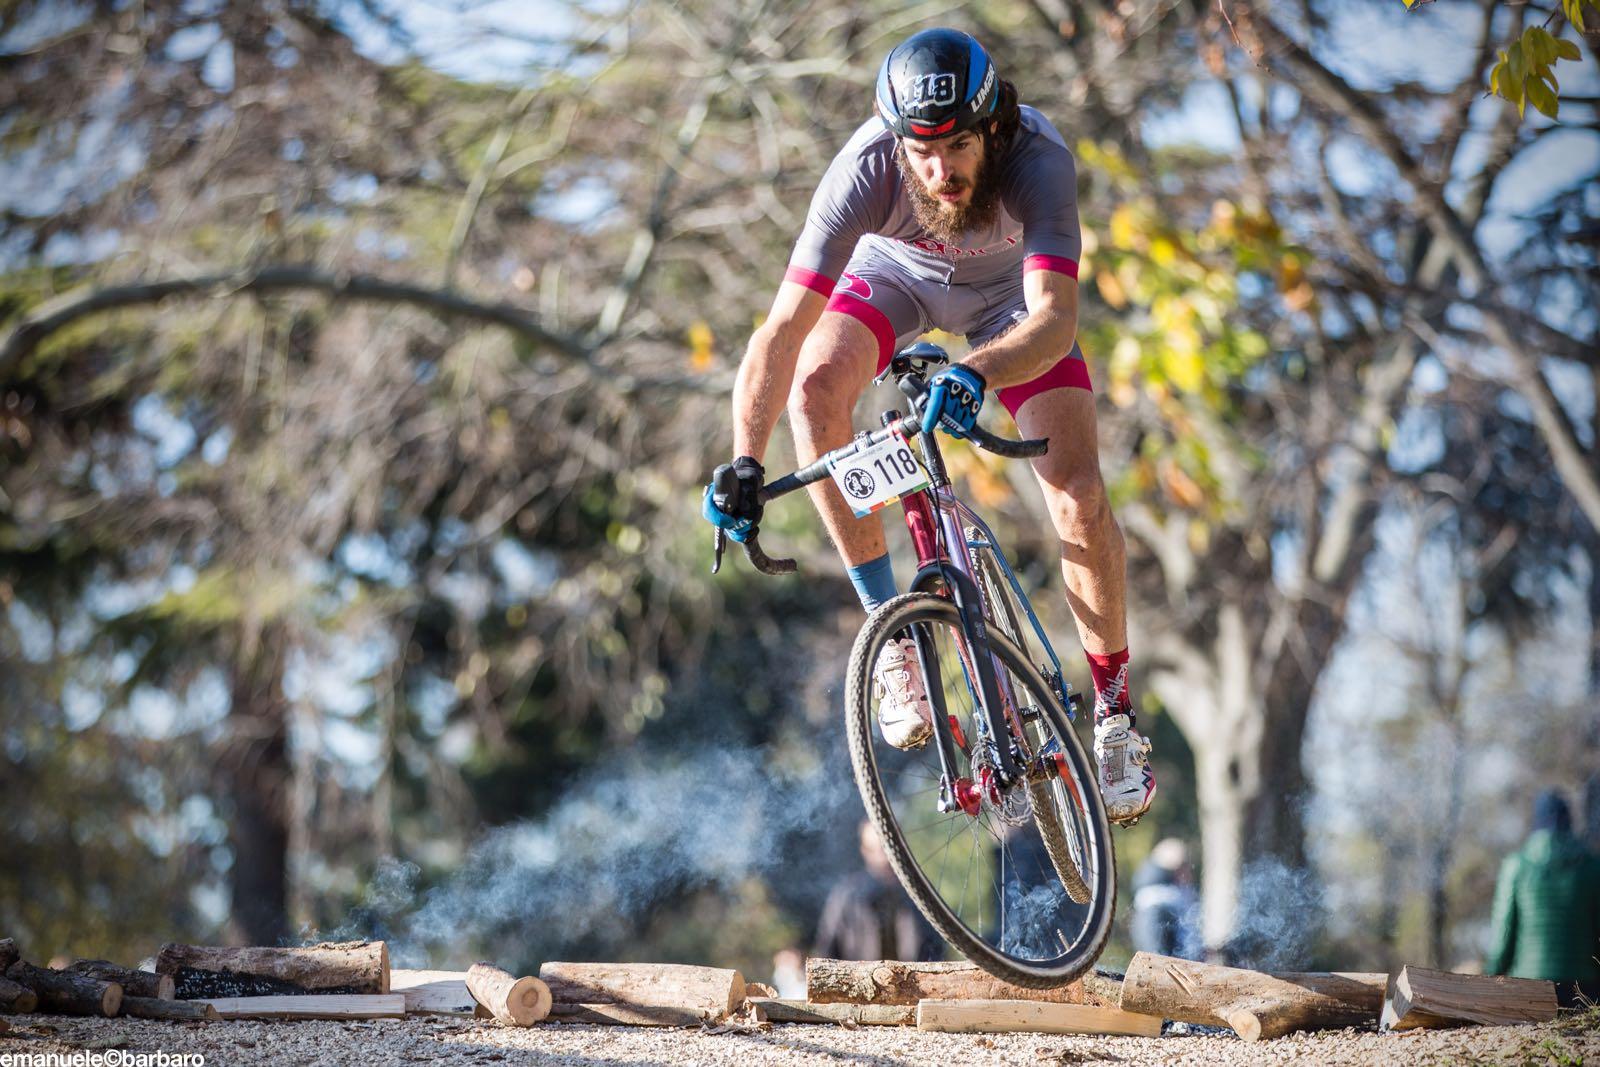 andrea-pirazzoli-cyclocross-singlespeed-world-champion-verona-bice-bicycles